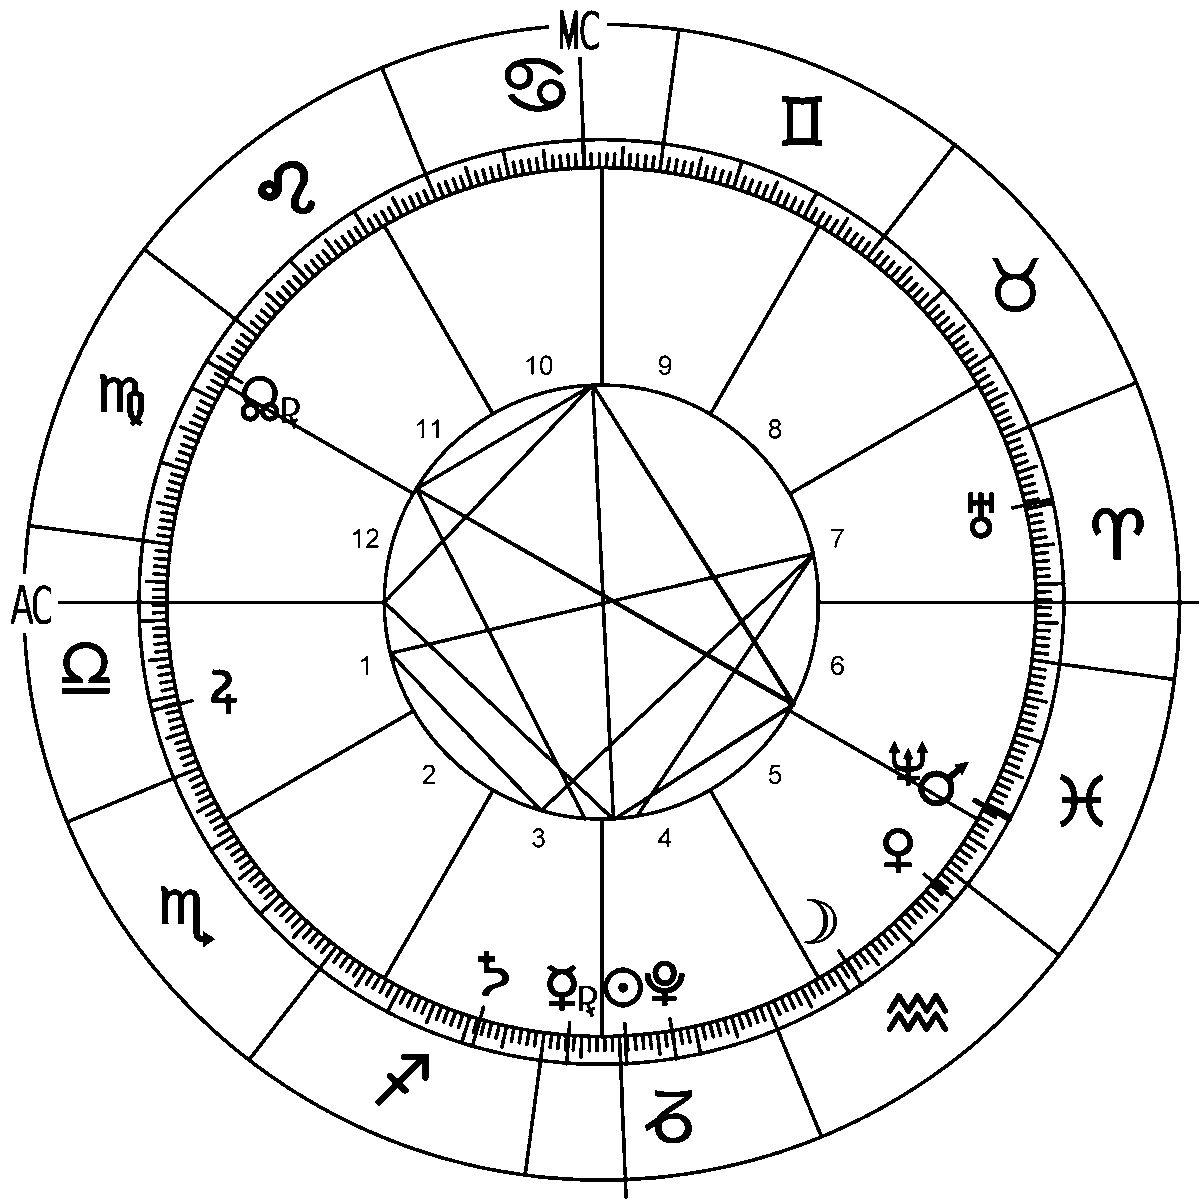 Leo 20 Horoscope Zodiac Sign Astrology   Birth chart, Birth ...